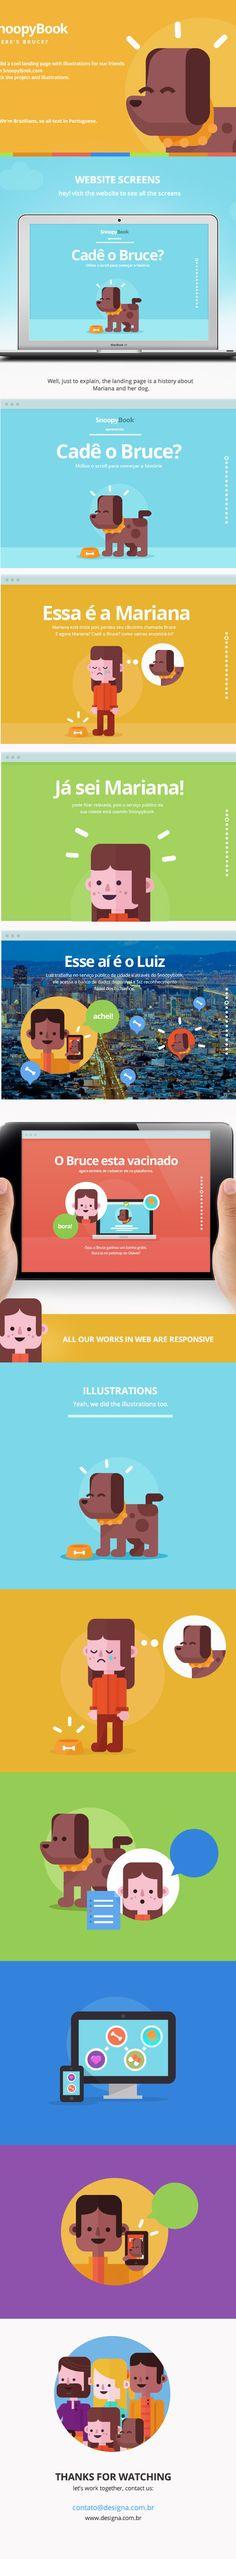 SnoopyBook.com - Landing page by Designa Web, via Behance